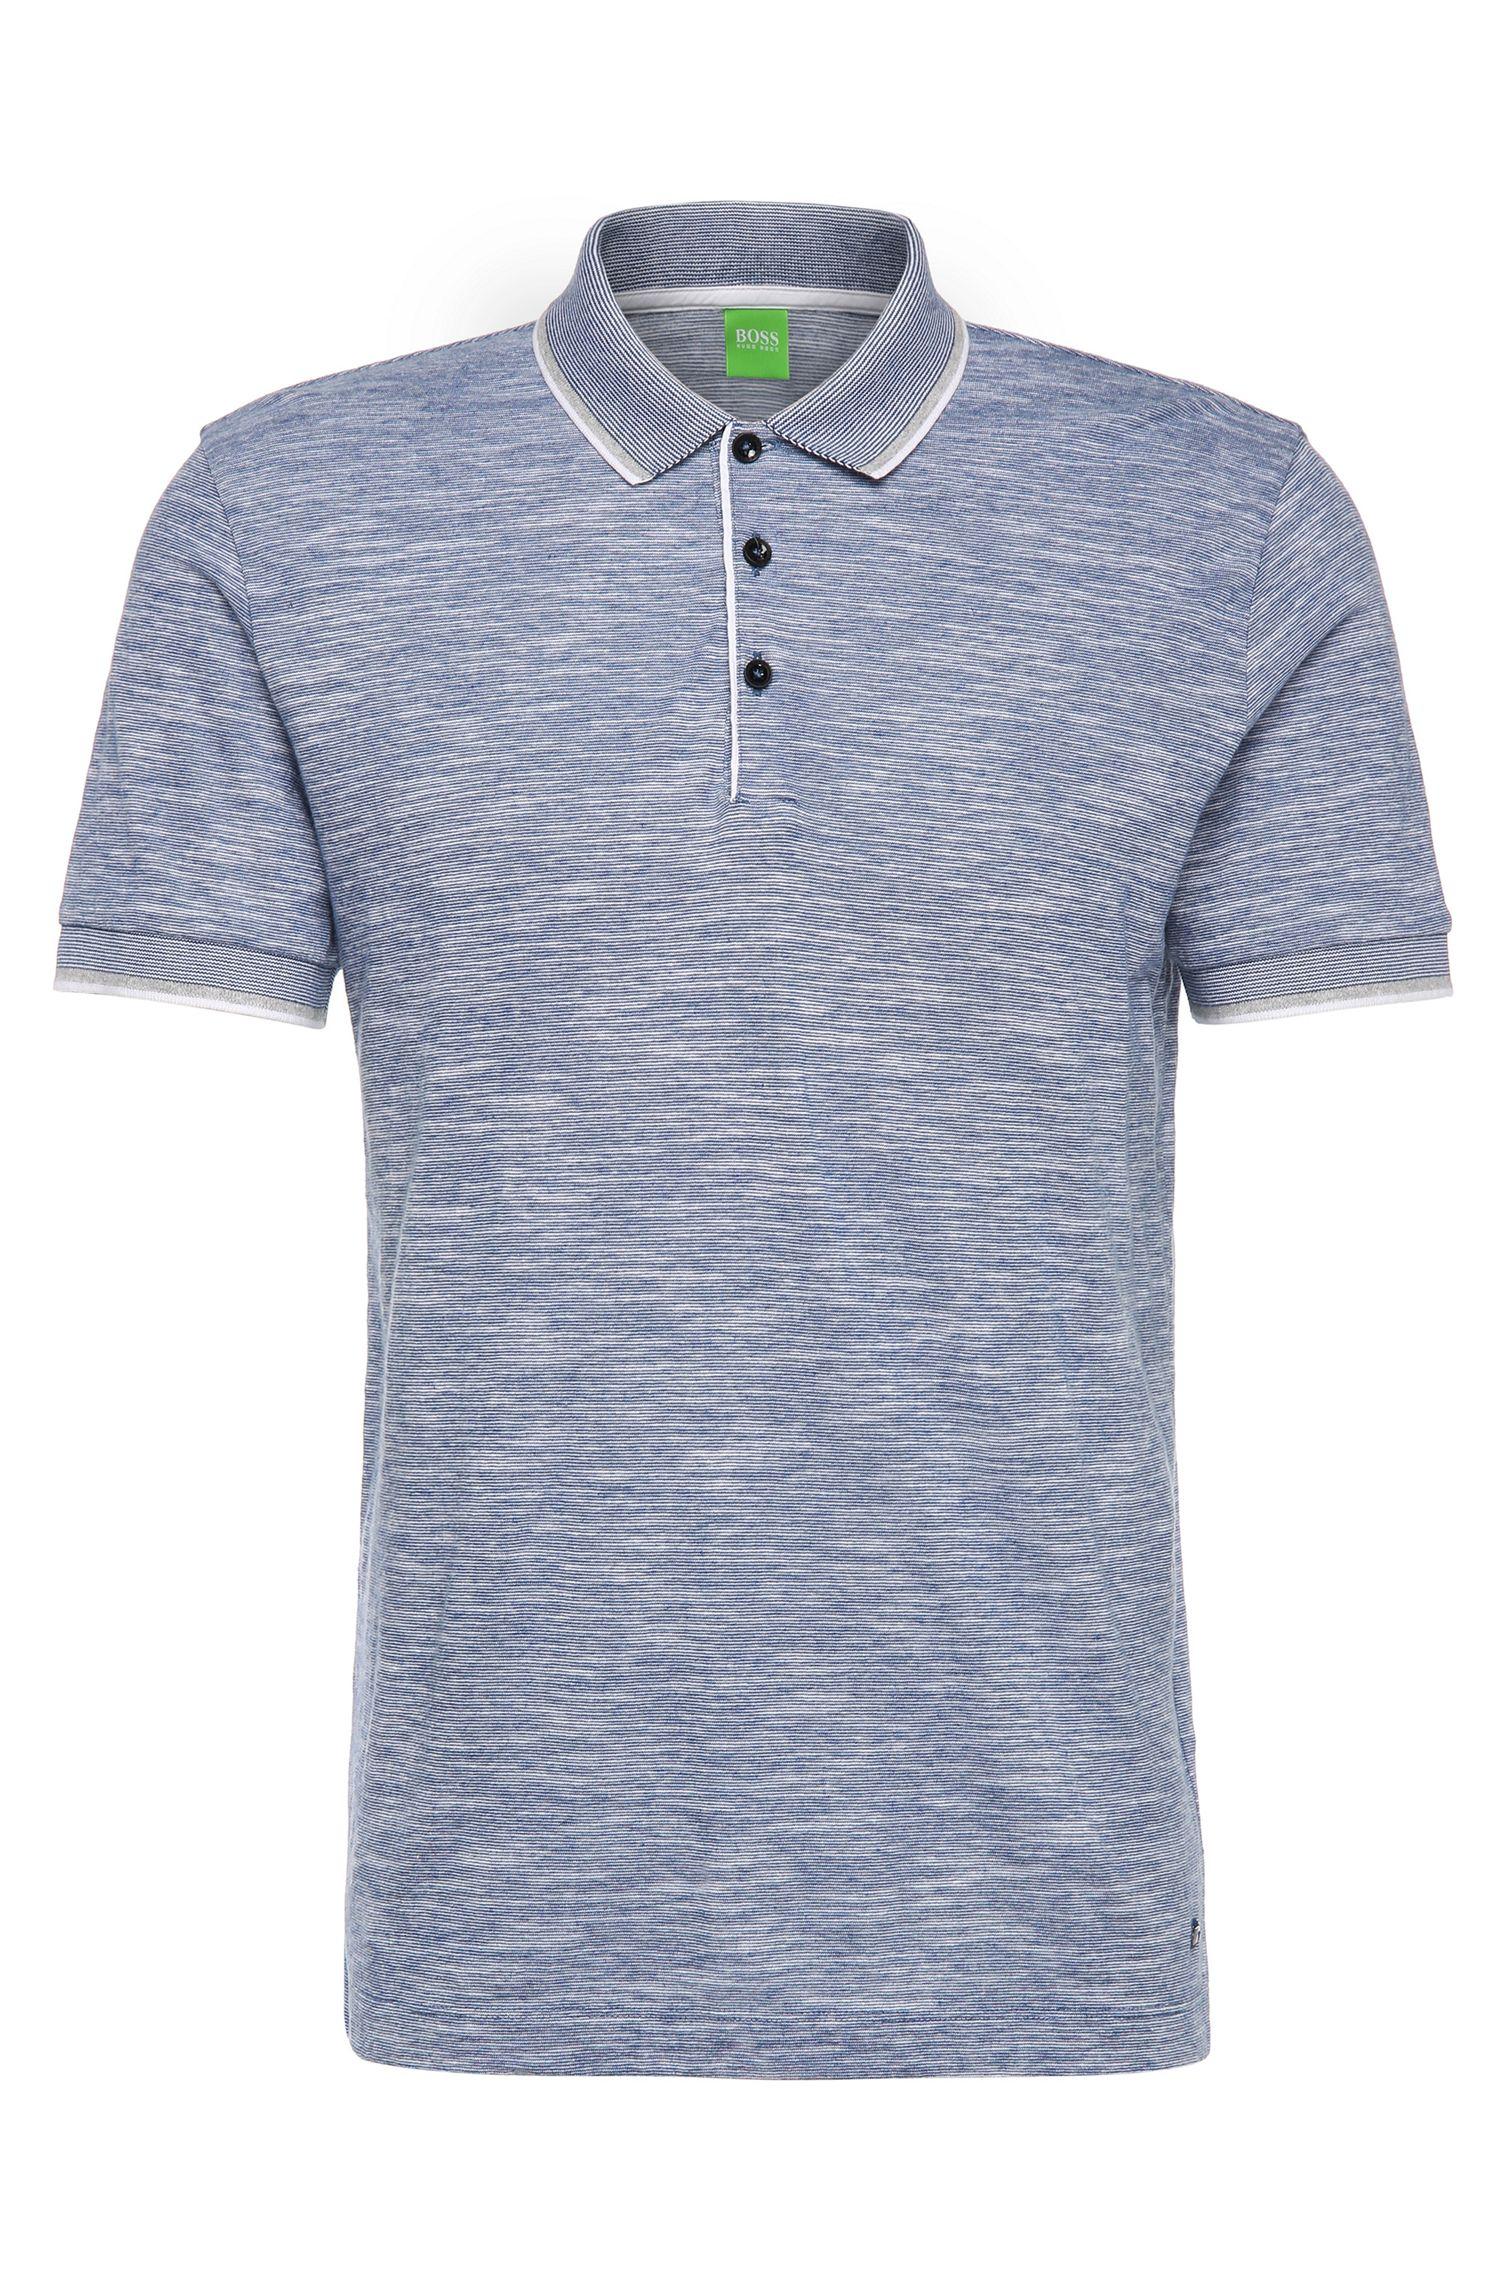 Slim-Fit Poloshirt aus Baumwoll-Mix in Melange-Optik: ´C-Padria`